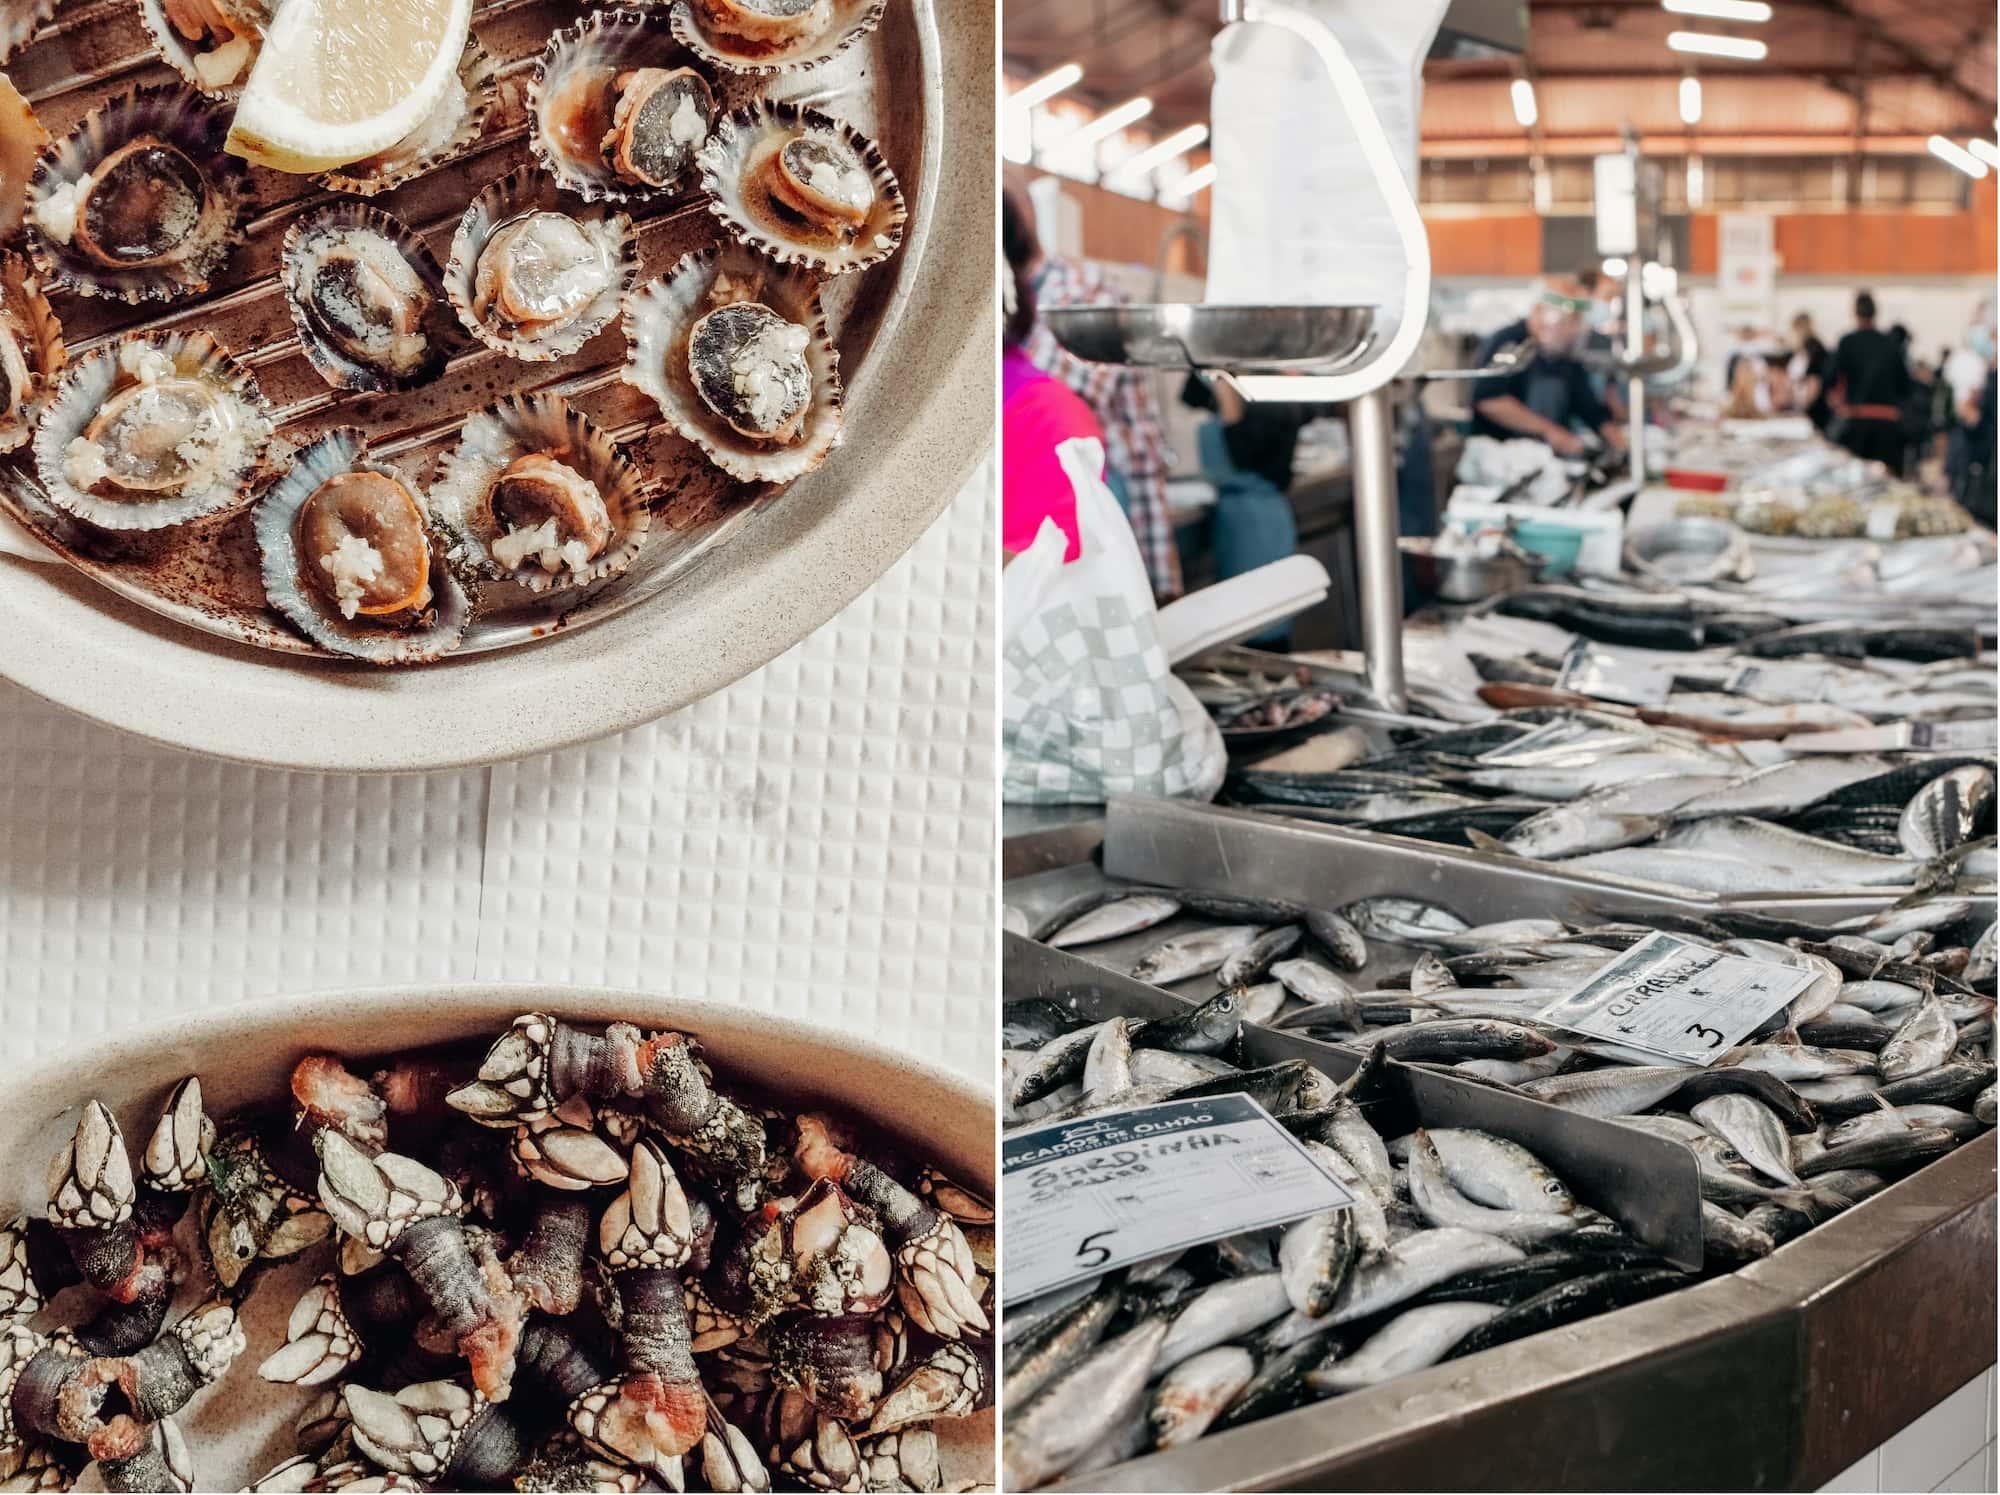 fischmarkt algarve portugal